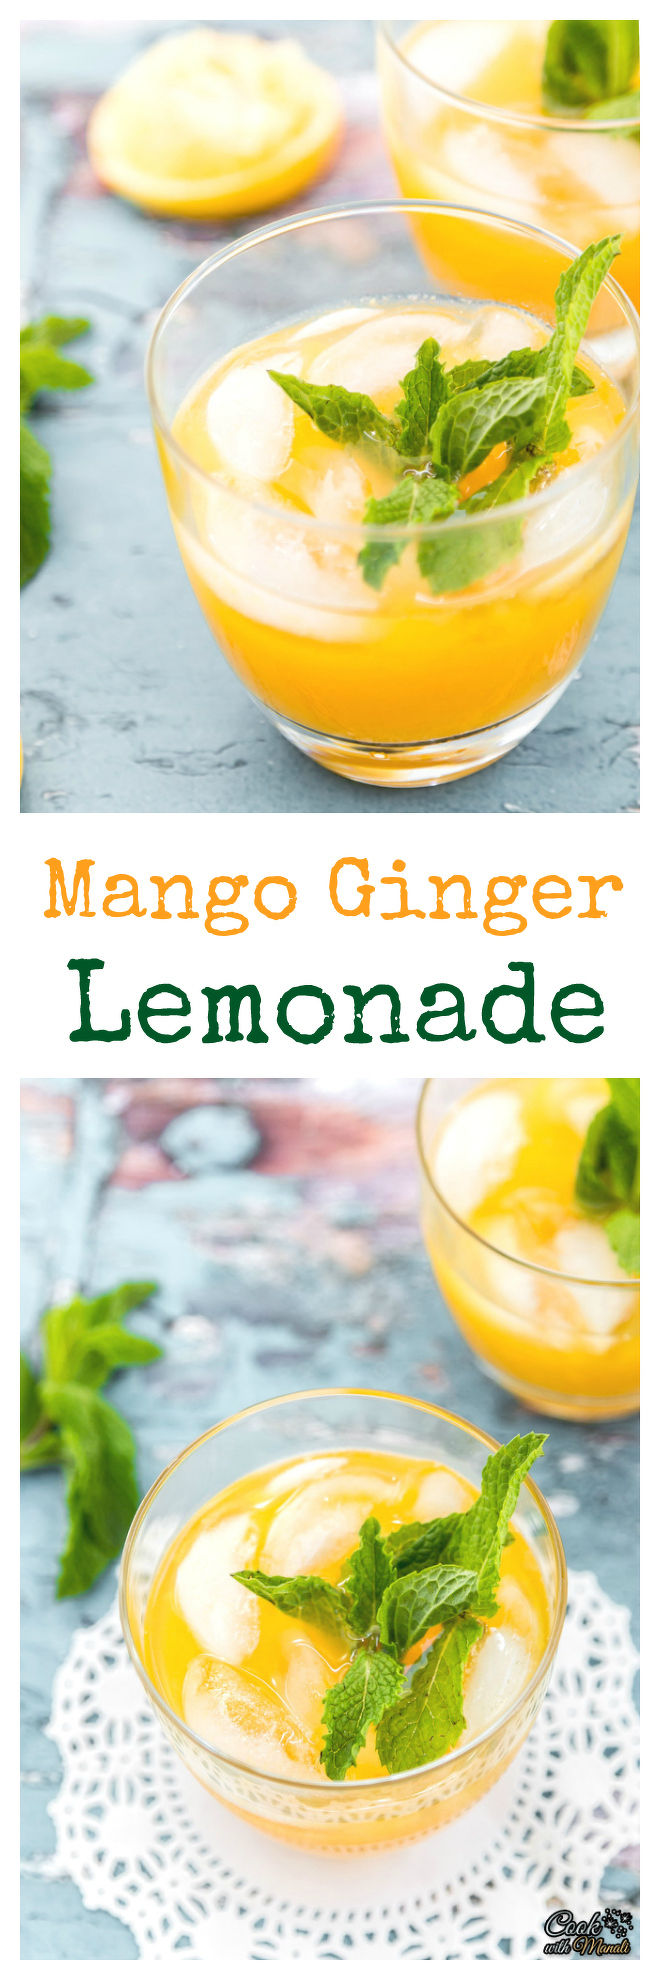 Mango-Ginger-Lemonade-Collage-nocwm